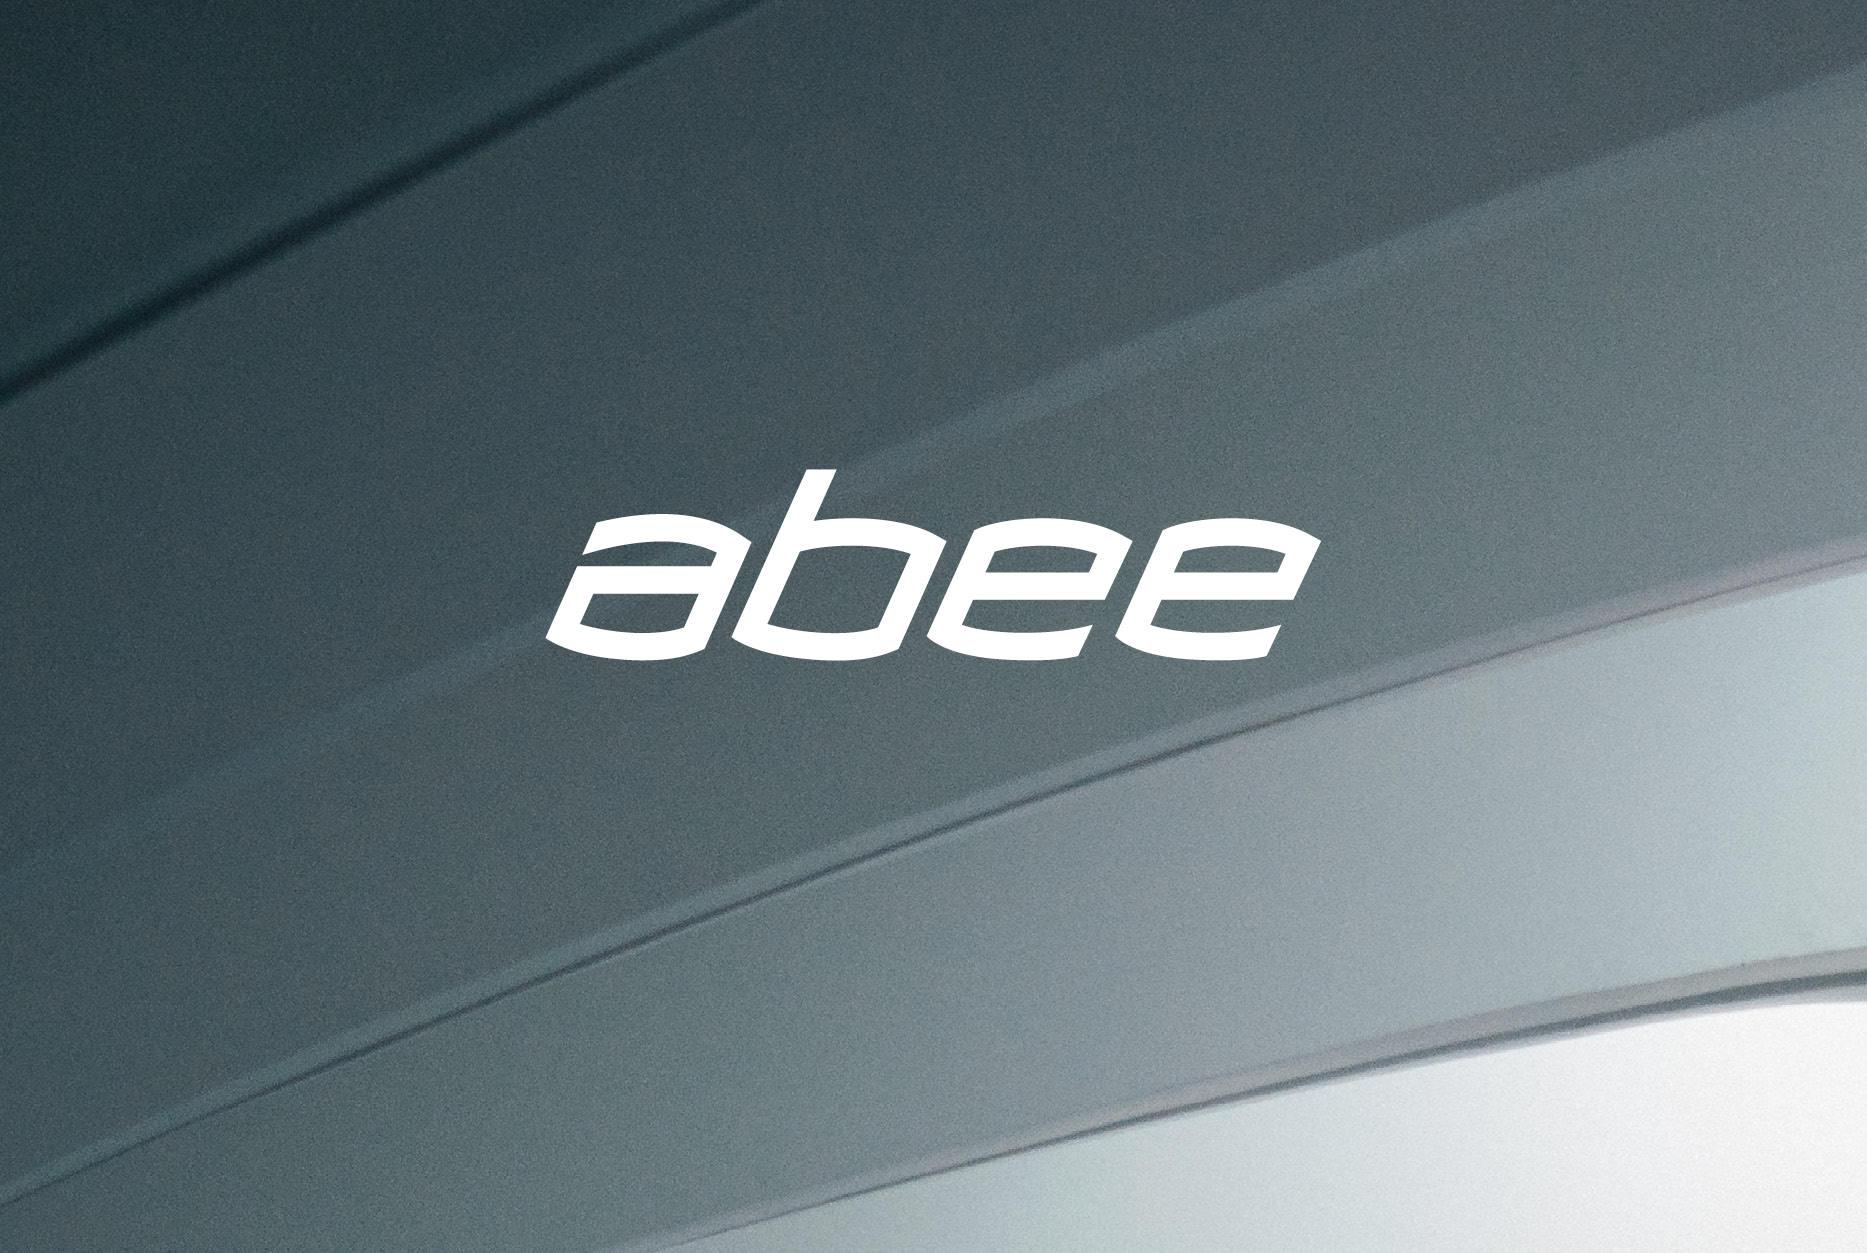 abee科技品牌設計